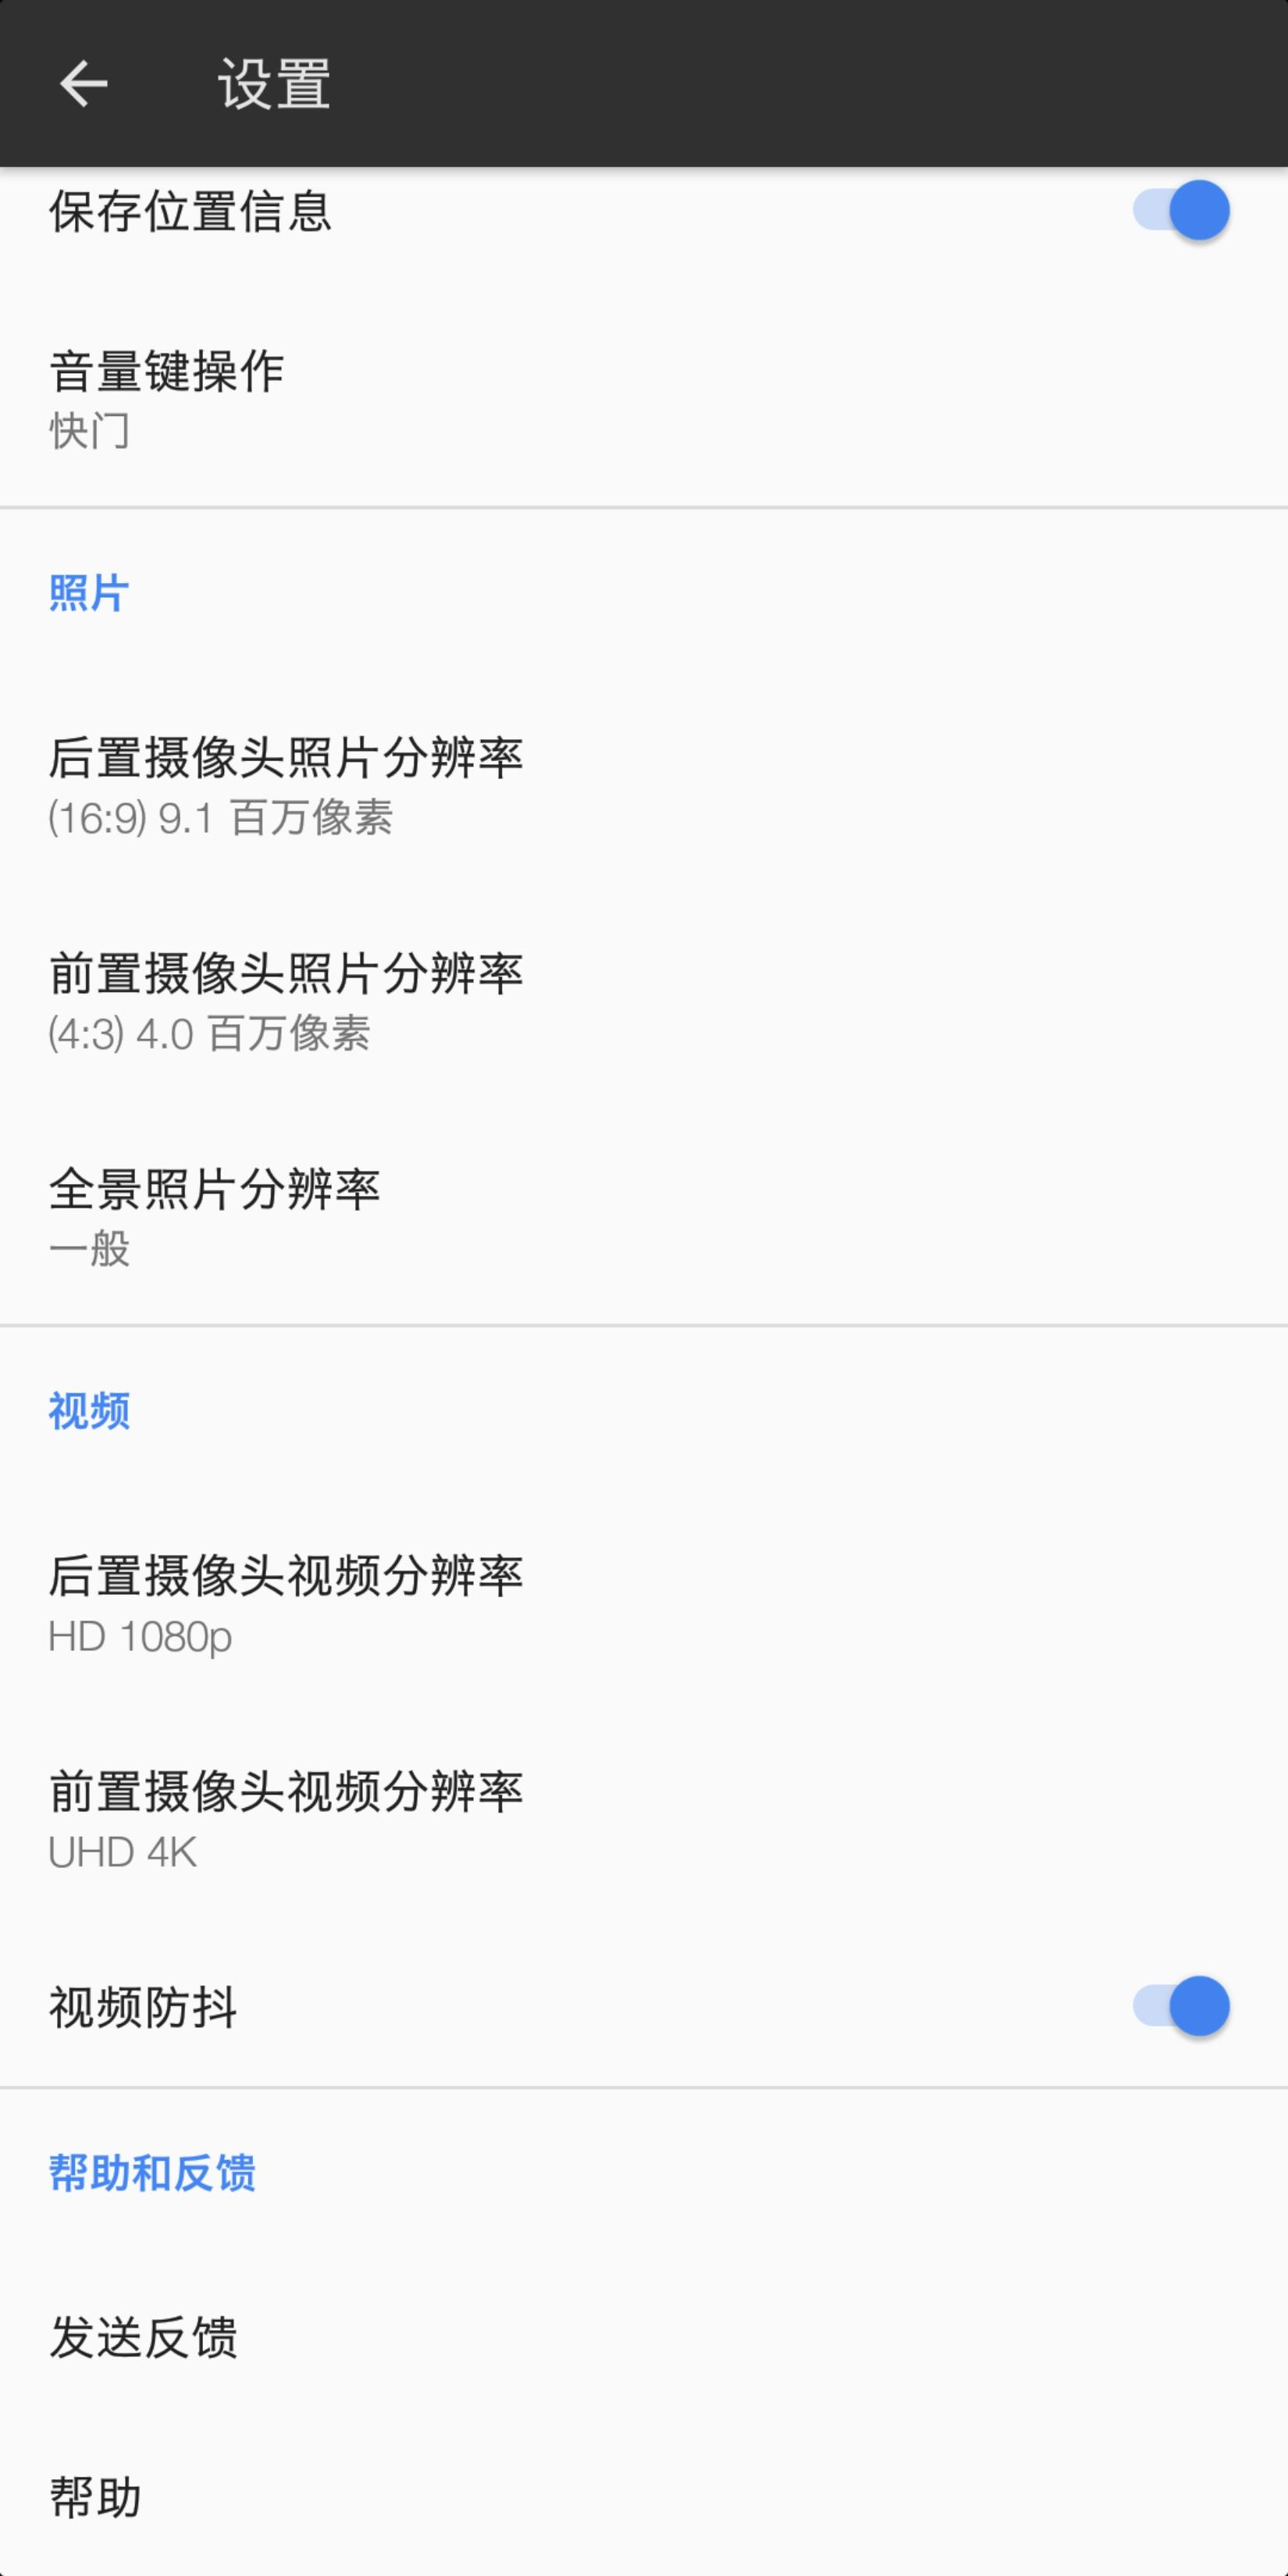 Screenshot_2018-12-06-19-56-40-564.png